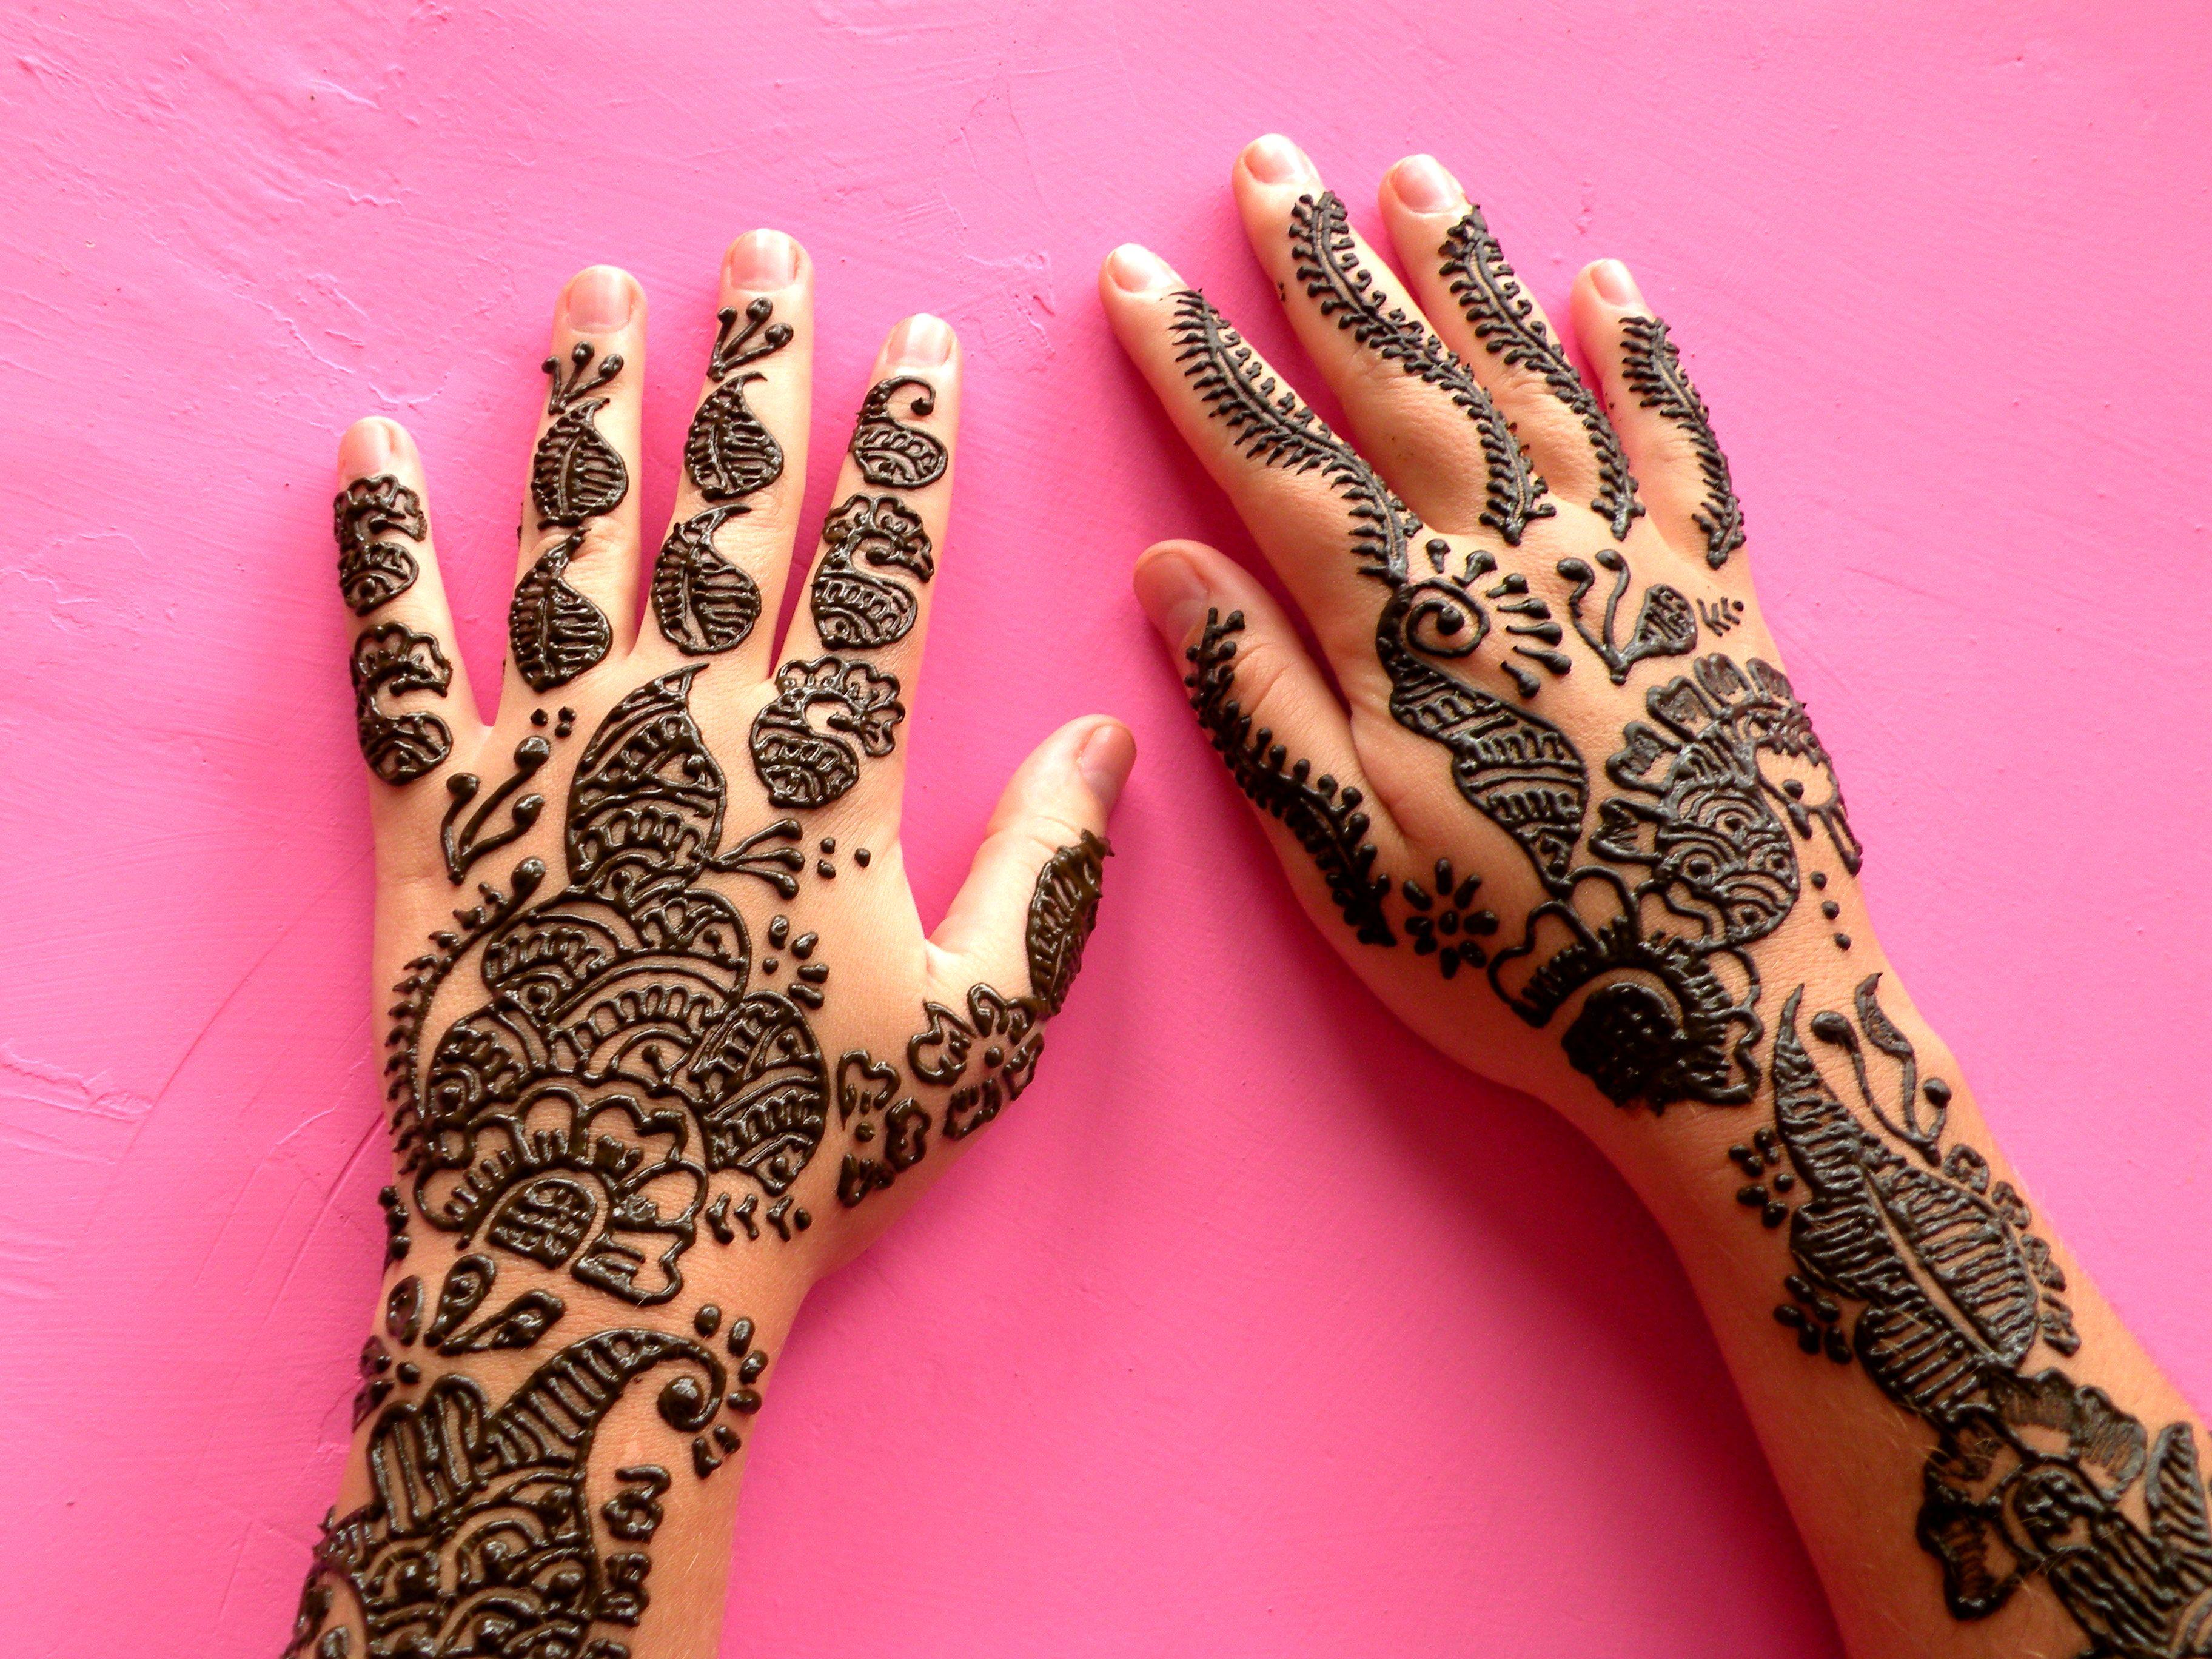 Henna tattoo charleston sc - Henna Tattoo Charleston Scauthentic Henna Tattoos India